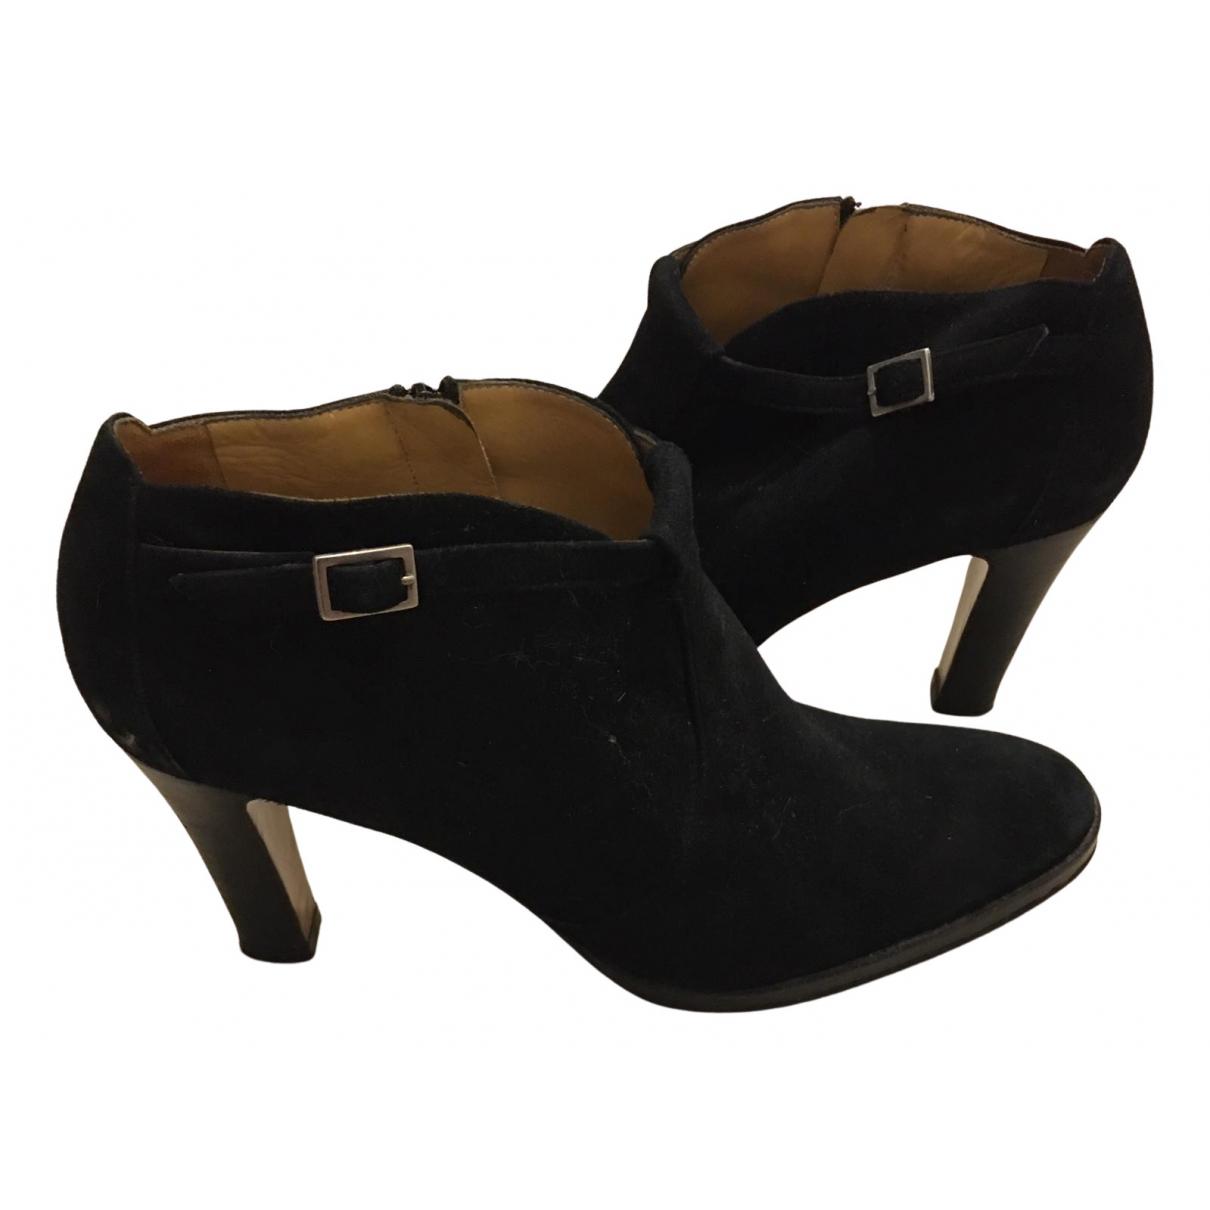 Atelier Voisin N Black Suede Ankle boots for Women 41 EU